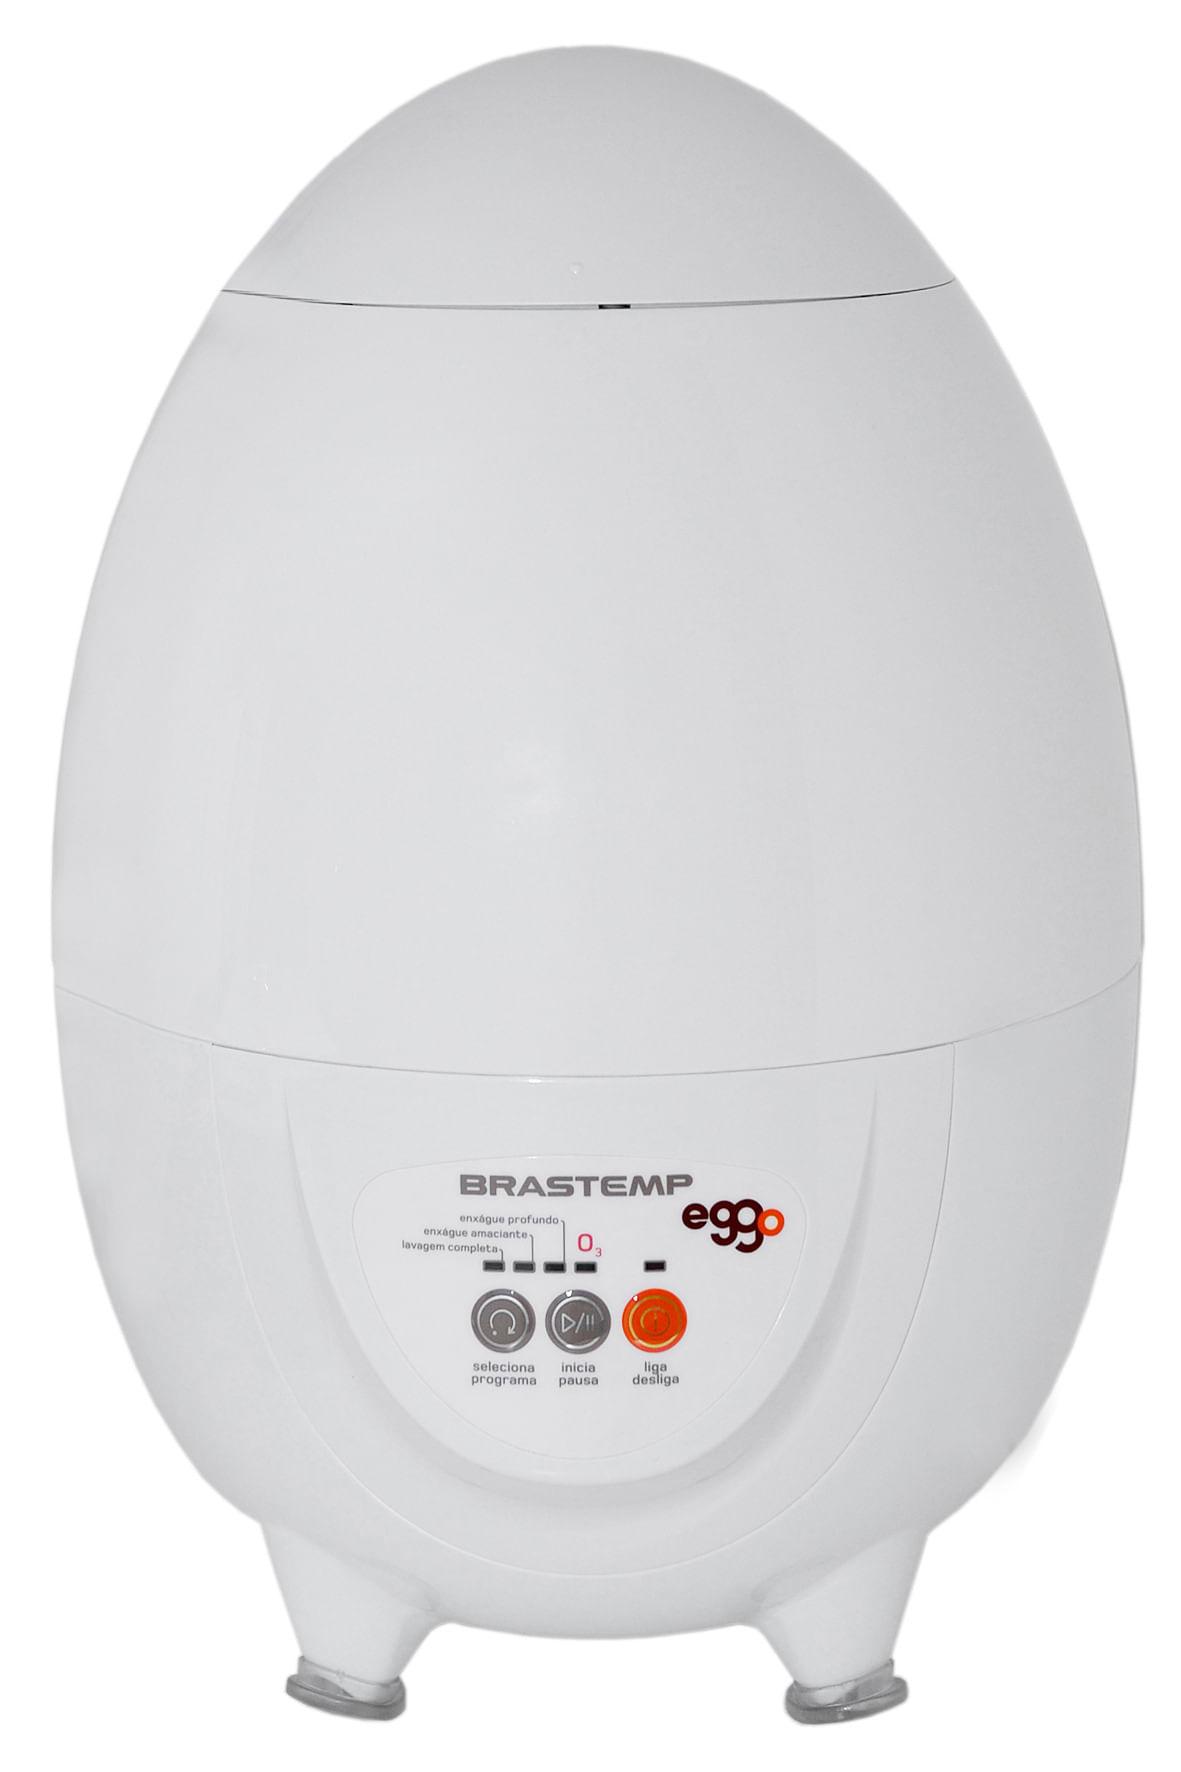 Mini Lavadora Brastemp Eggo 1Kg